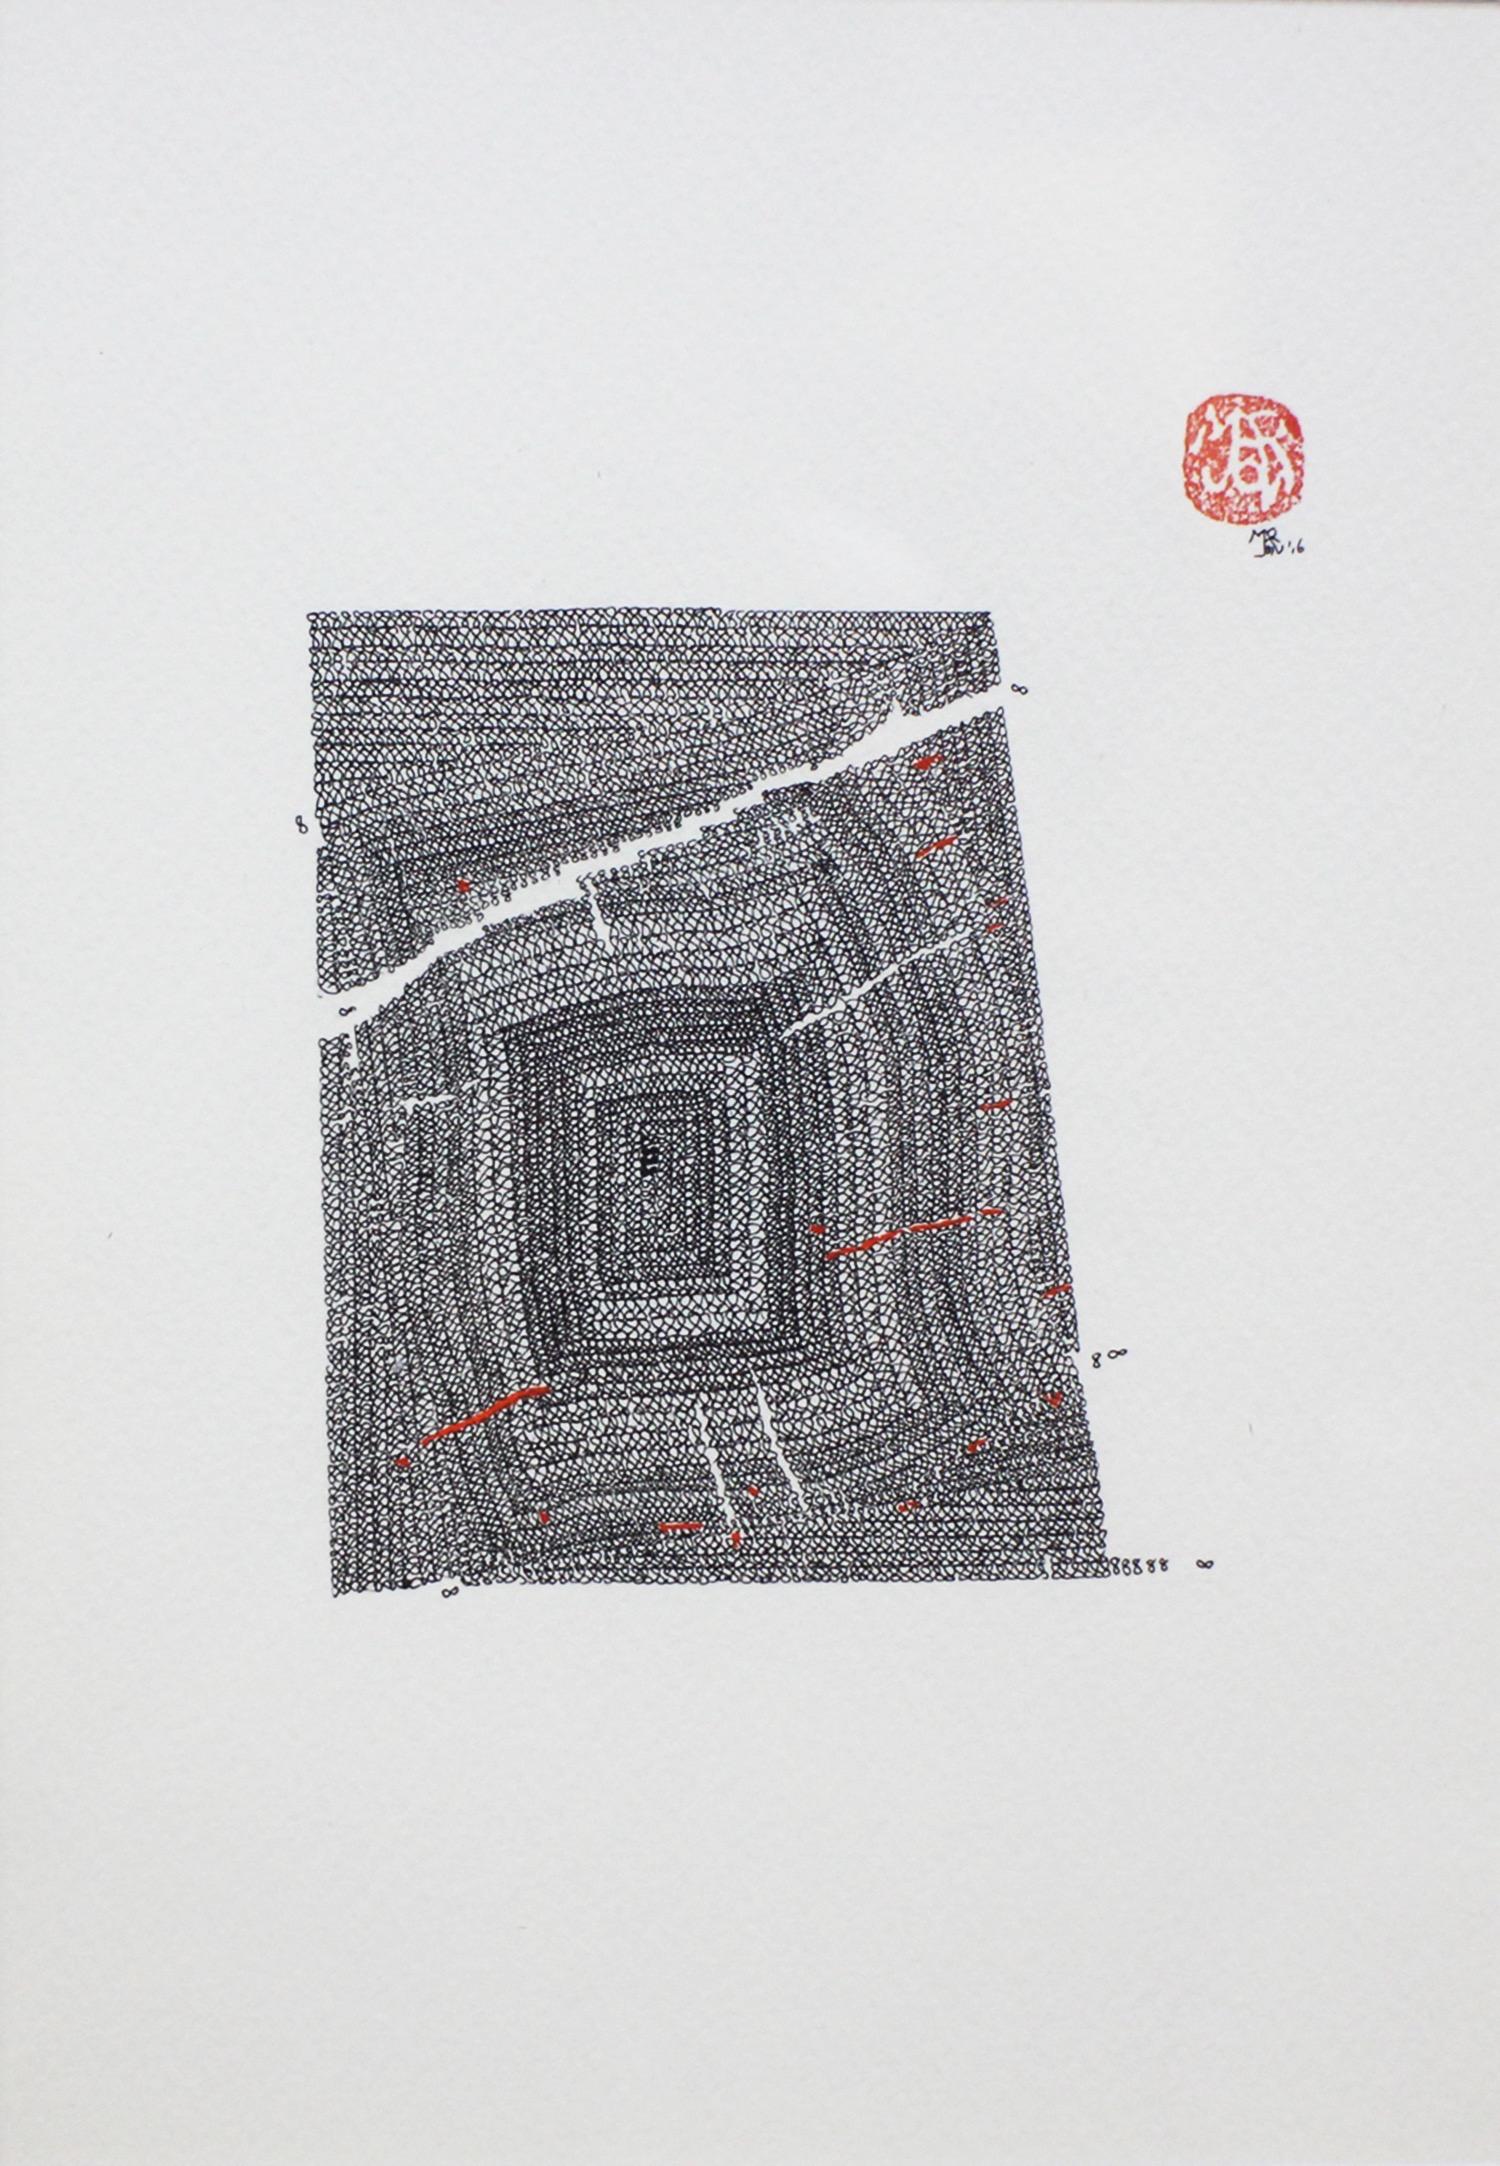 Marjon Barton, Untitled #30 (2016), 15x21.5cm, Ink on Paper